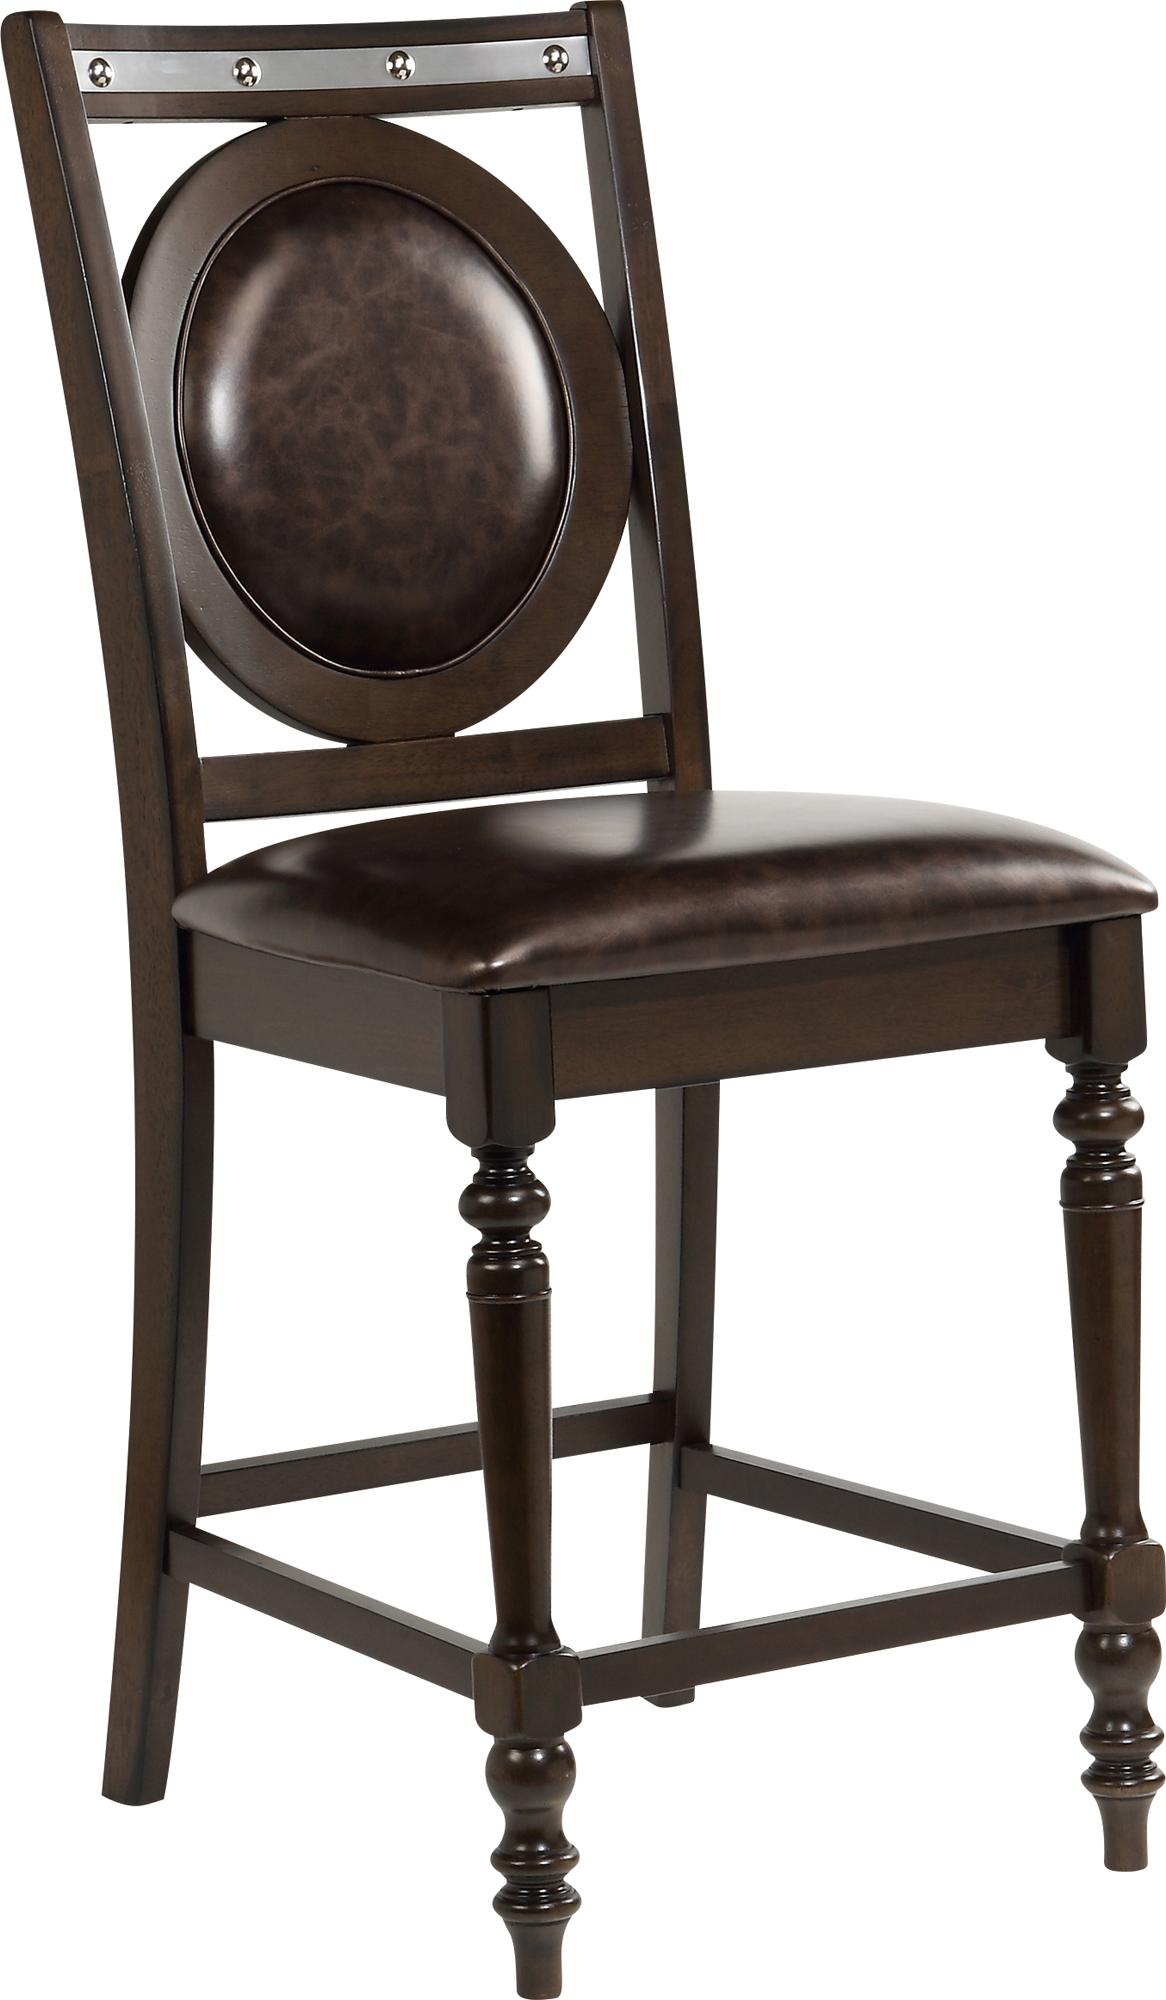 Bar Stool D4260 Elm Set Of 2 By Global Furniture